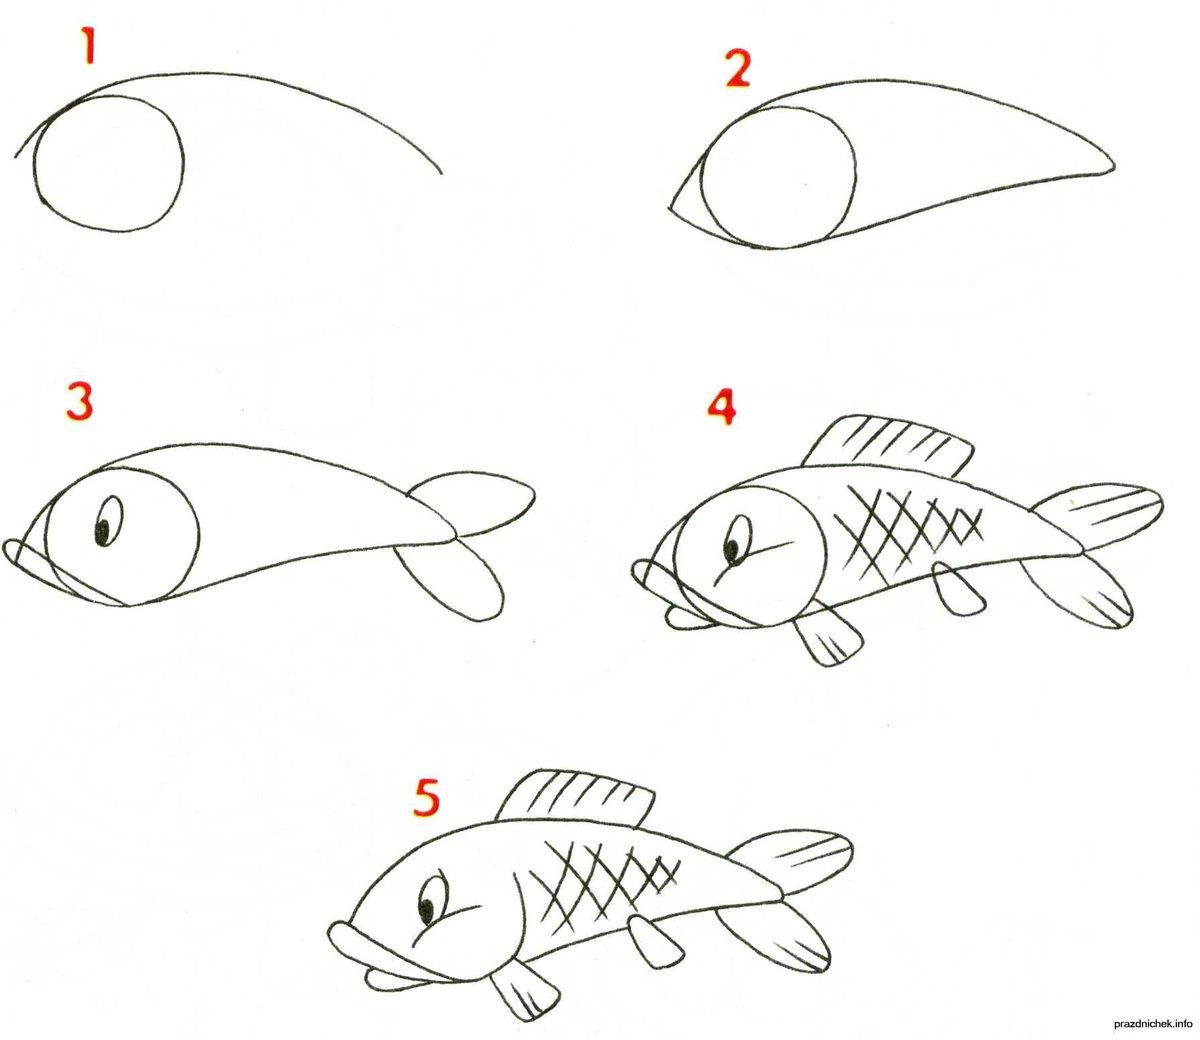 Учимся рисовать картинки поэтапно